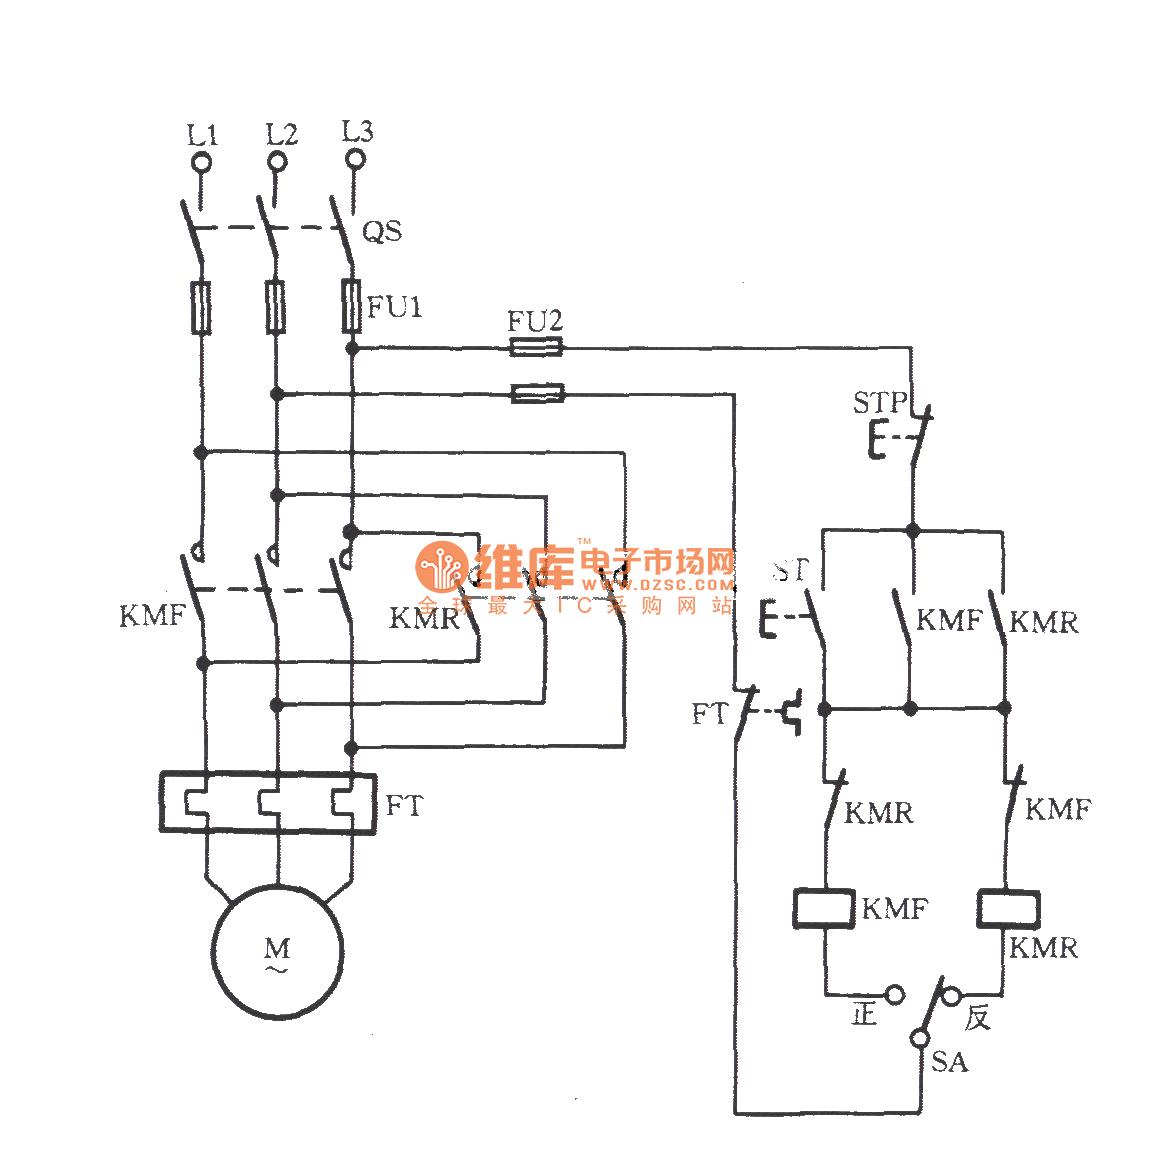 E46 Selector Switch Wiring Schematic Library Business Radio Harman Bmw Remote Start Amplifier Speaker Wire